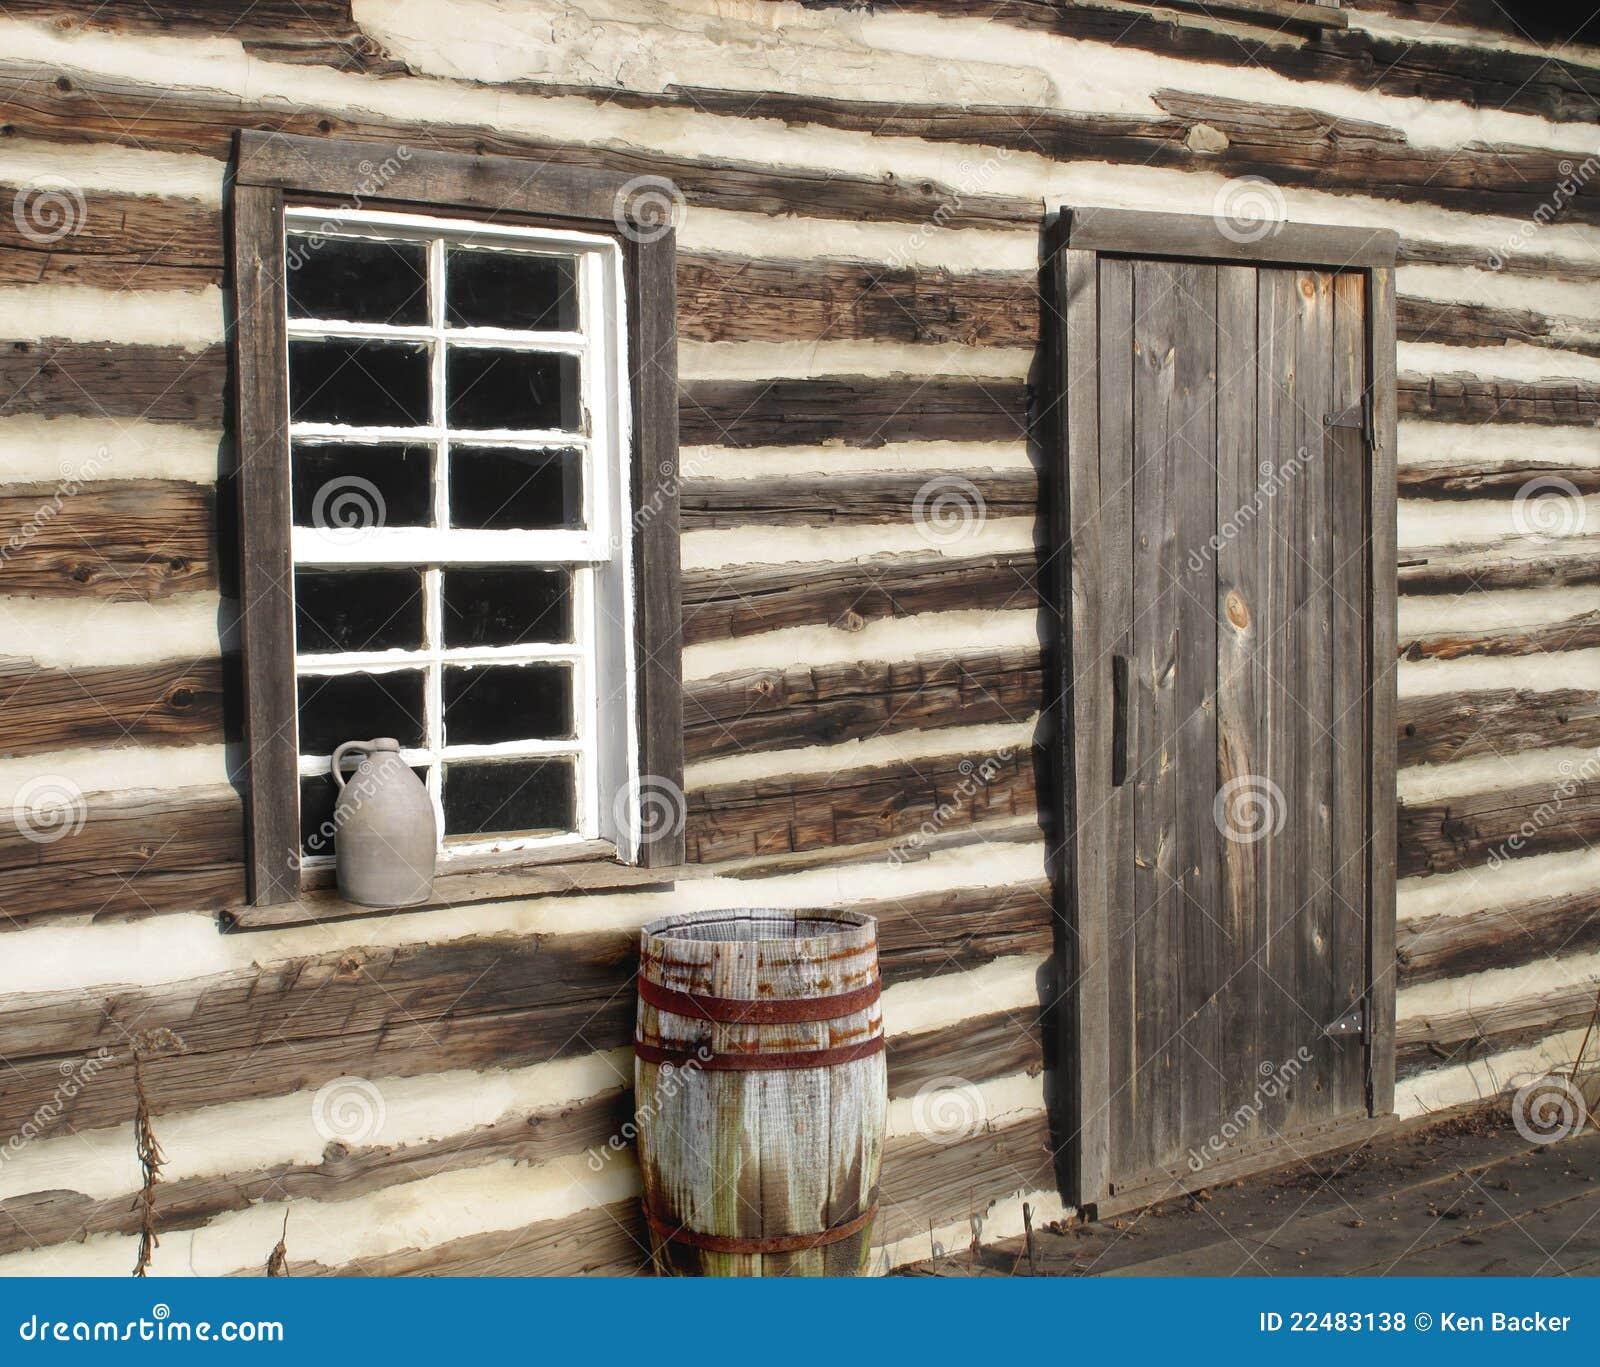 Log cabin door window close up stock photo image 22483138 for Log cabin window